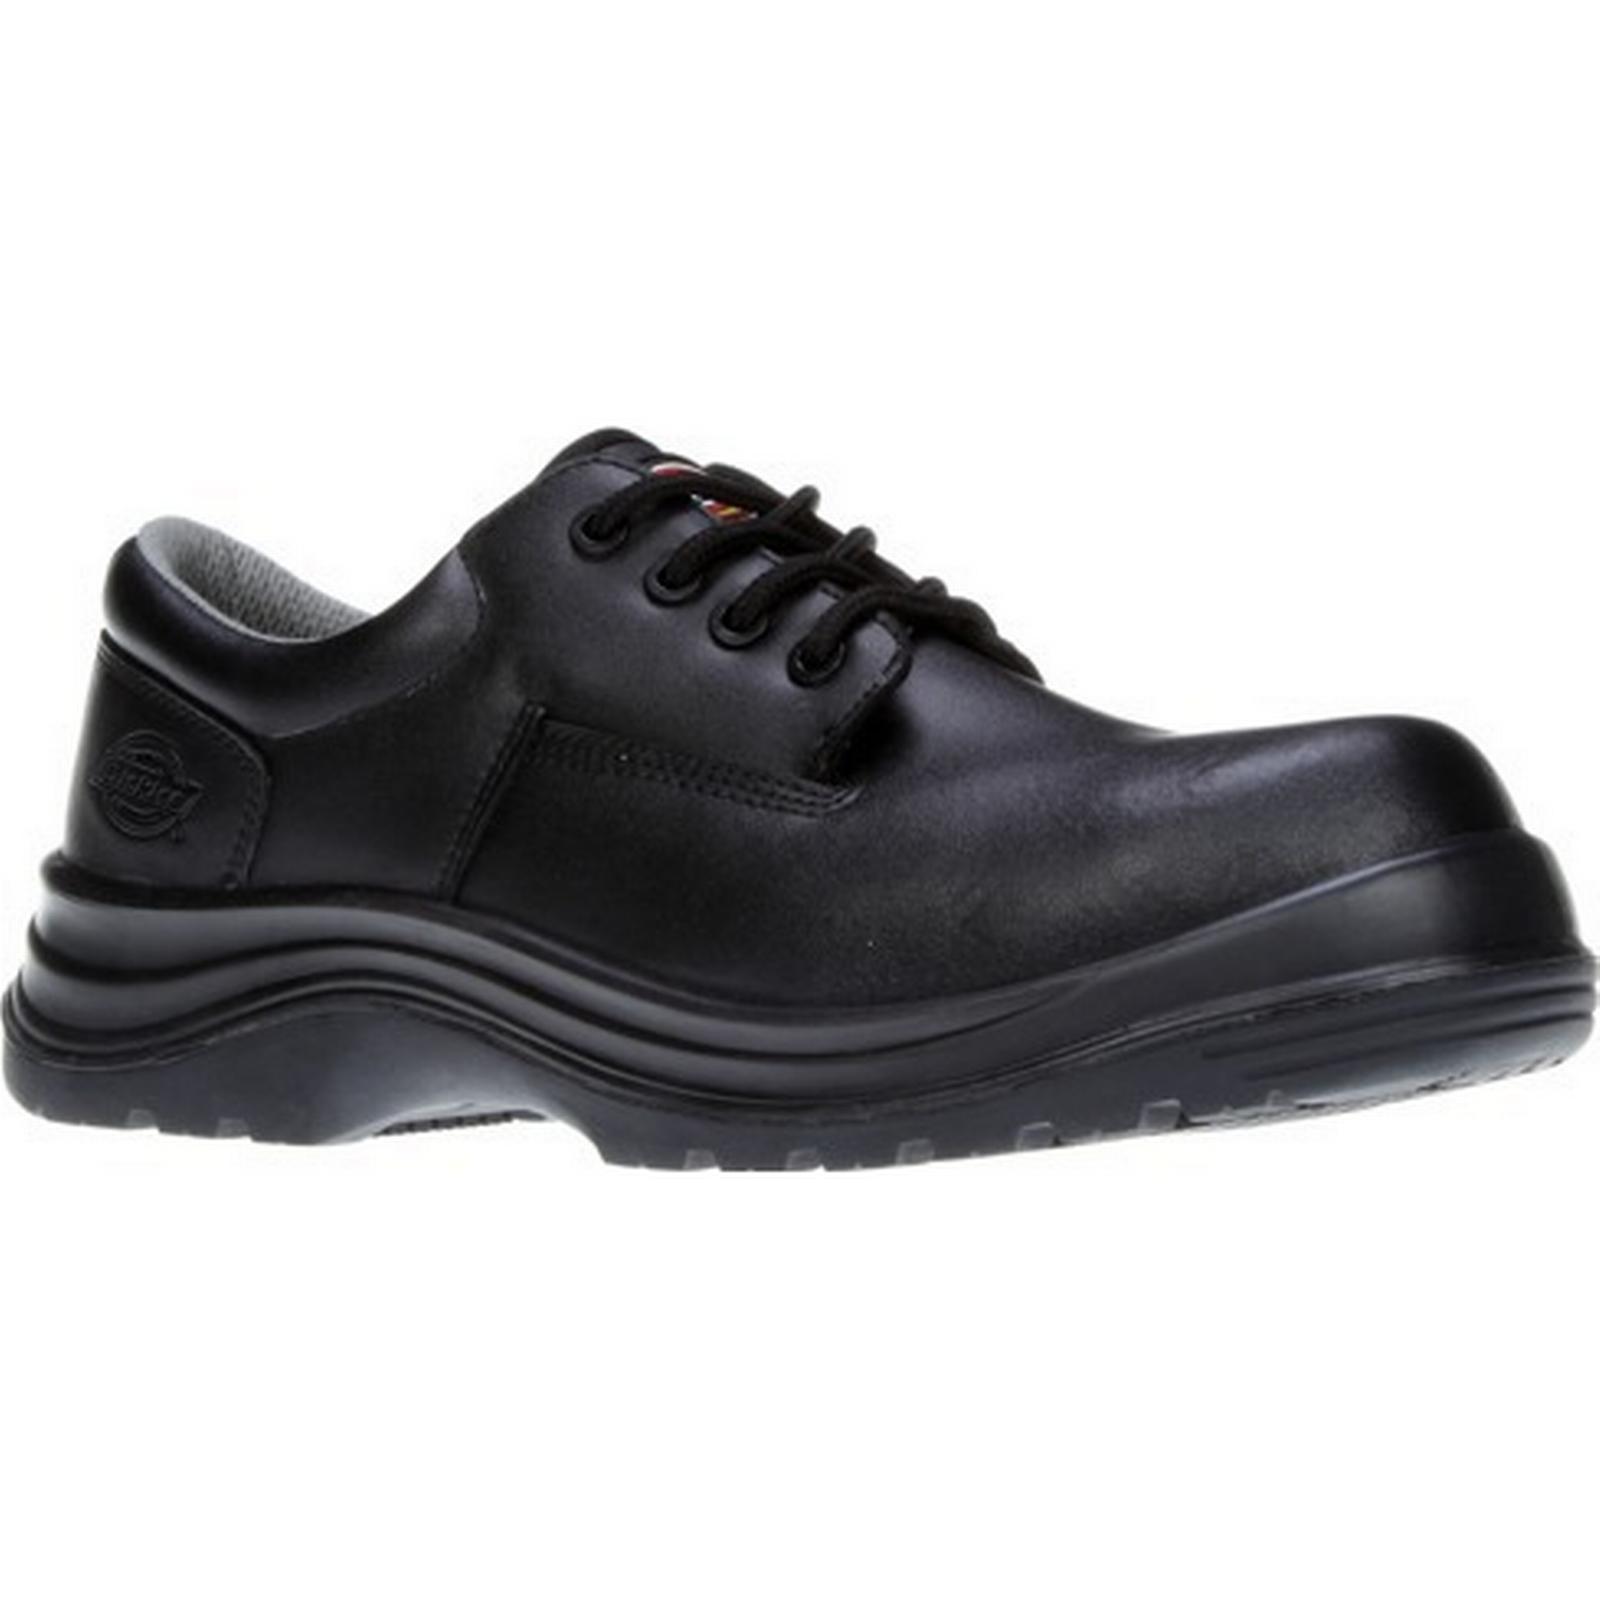 Dickies Workwear Workwear Dickies Armona Shoe Black / Size 06 8b47a1